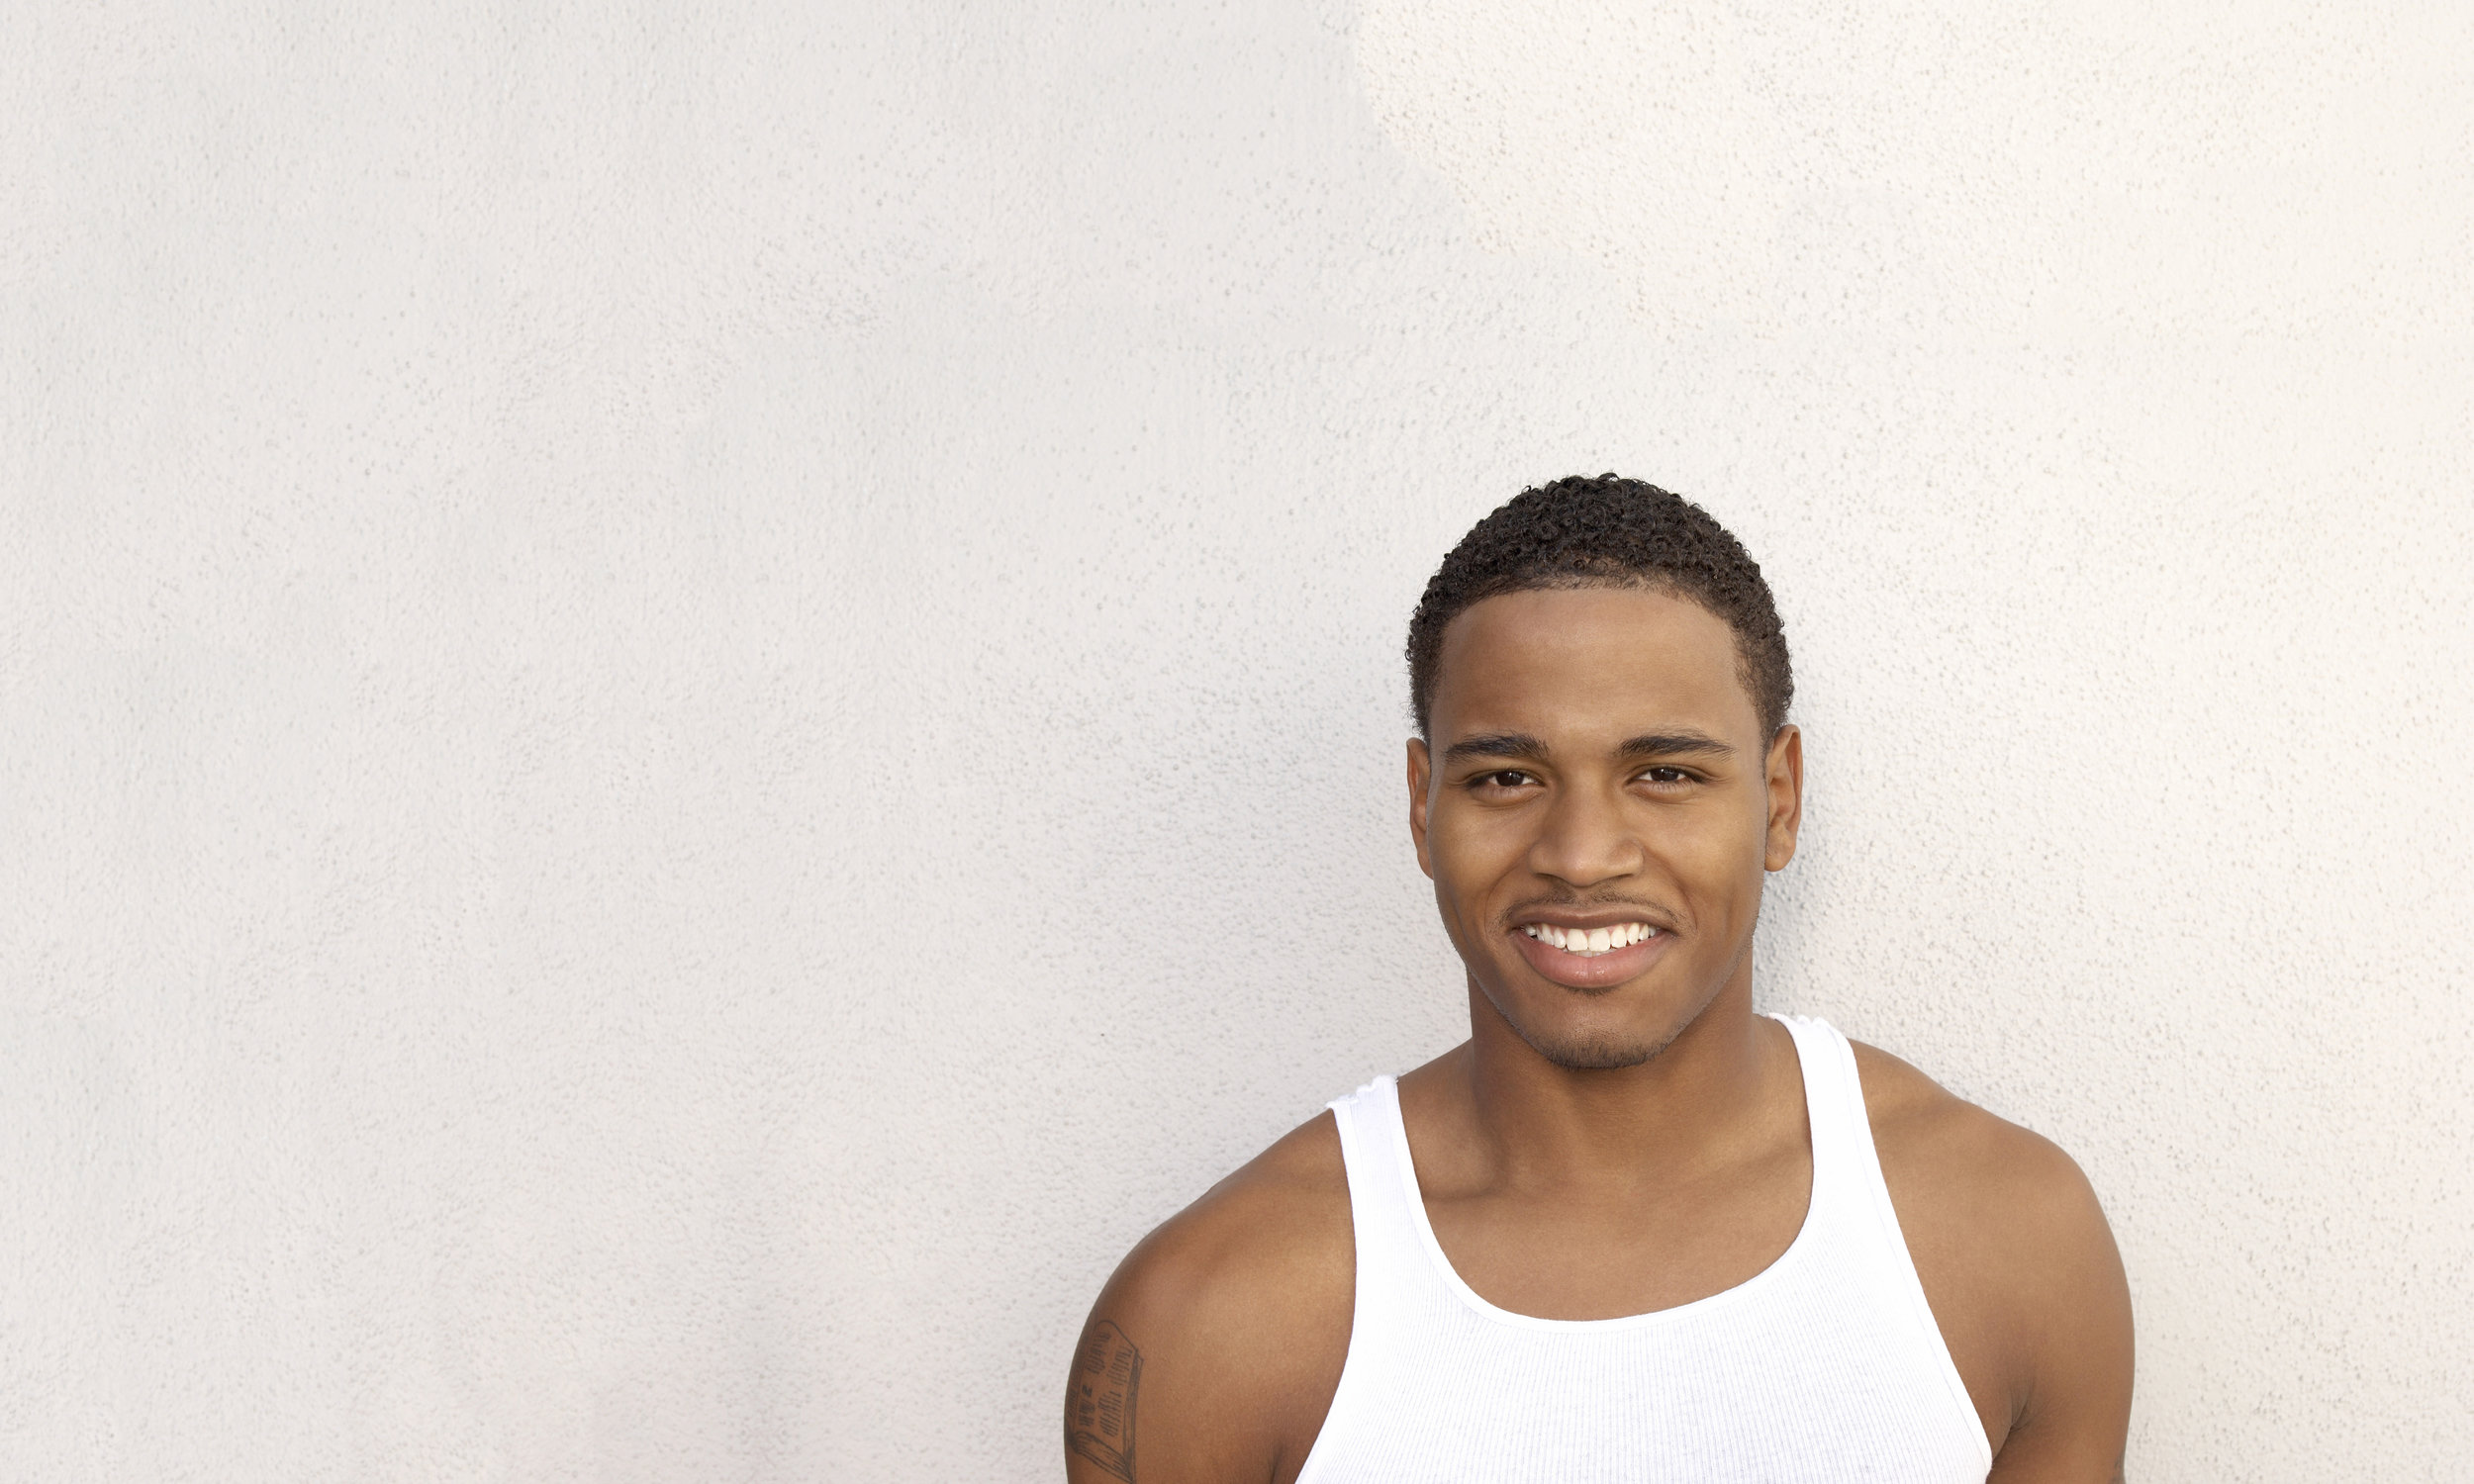 bigstock-Portrait-of-a-happy-African-Am-36427837.jpg